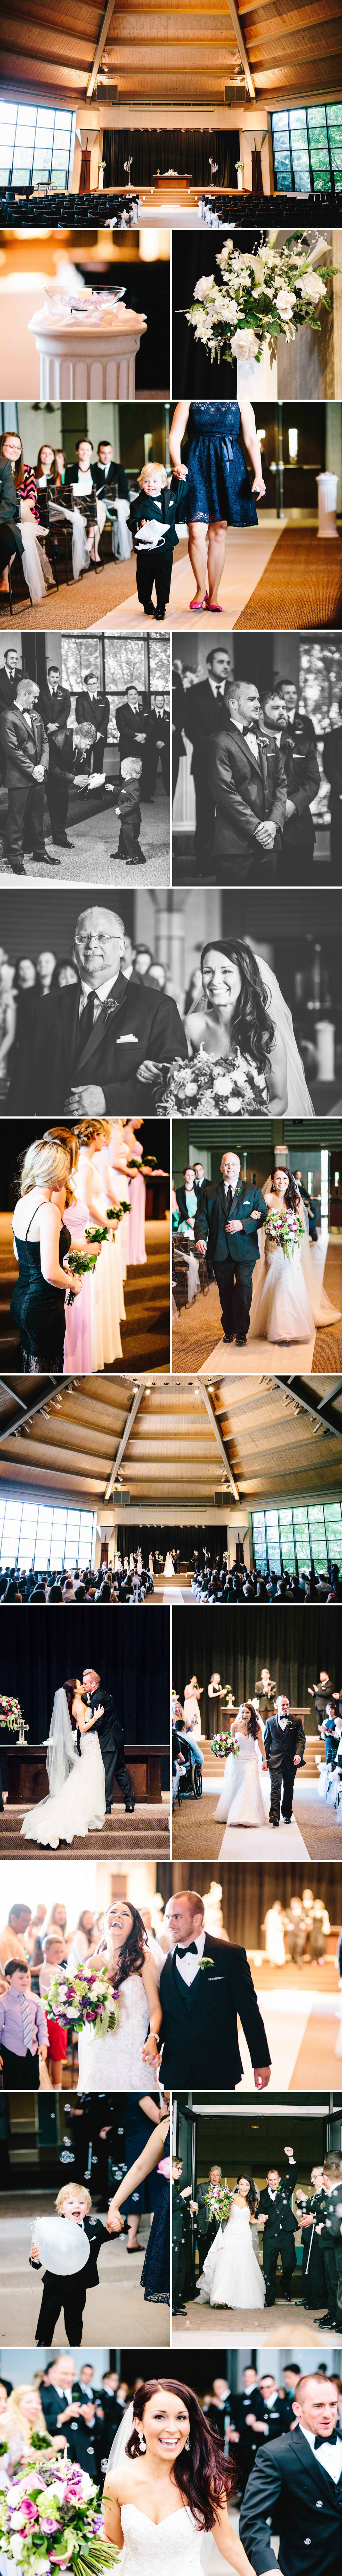 chicago-fine-art-wedding-photography-alger5